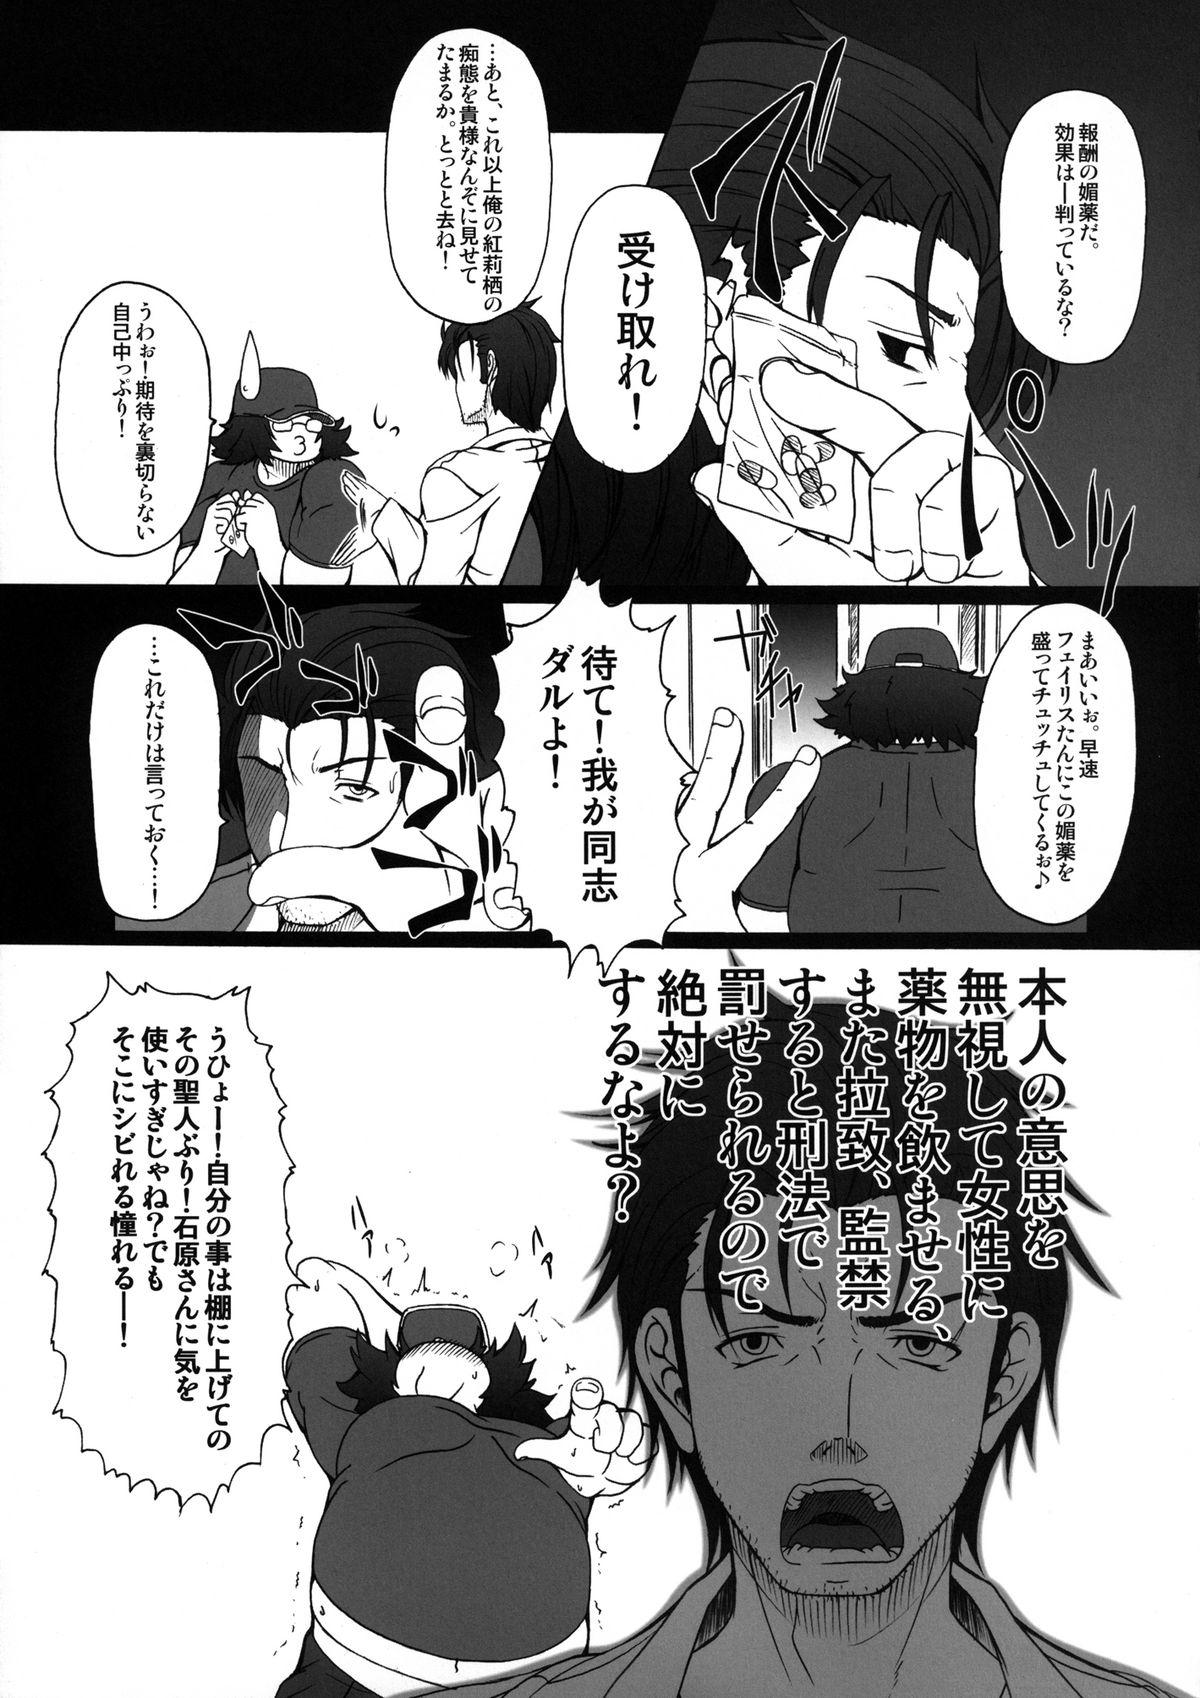 HOBBY'S BLOCK!! 14 Kairaku Tousaku no Ecstasy 16